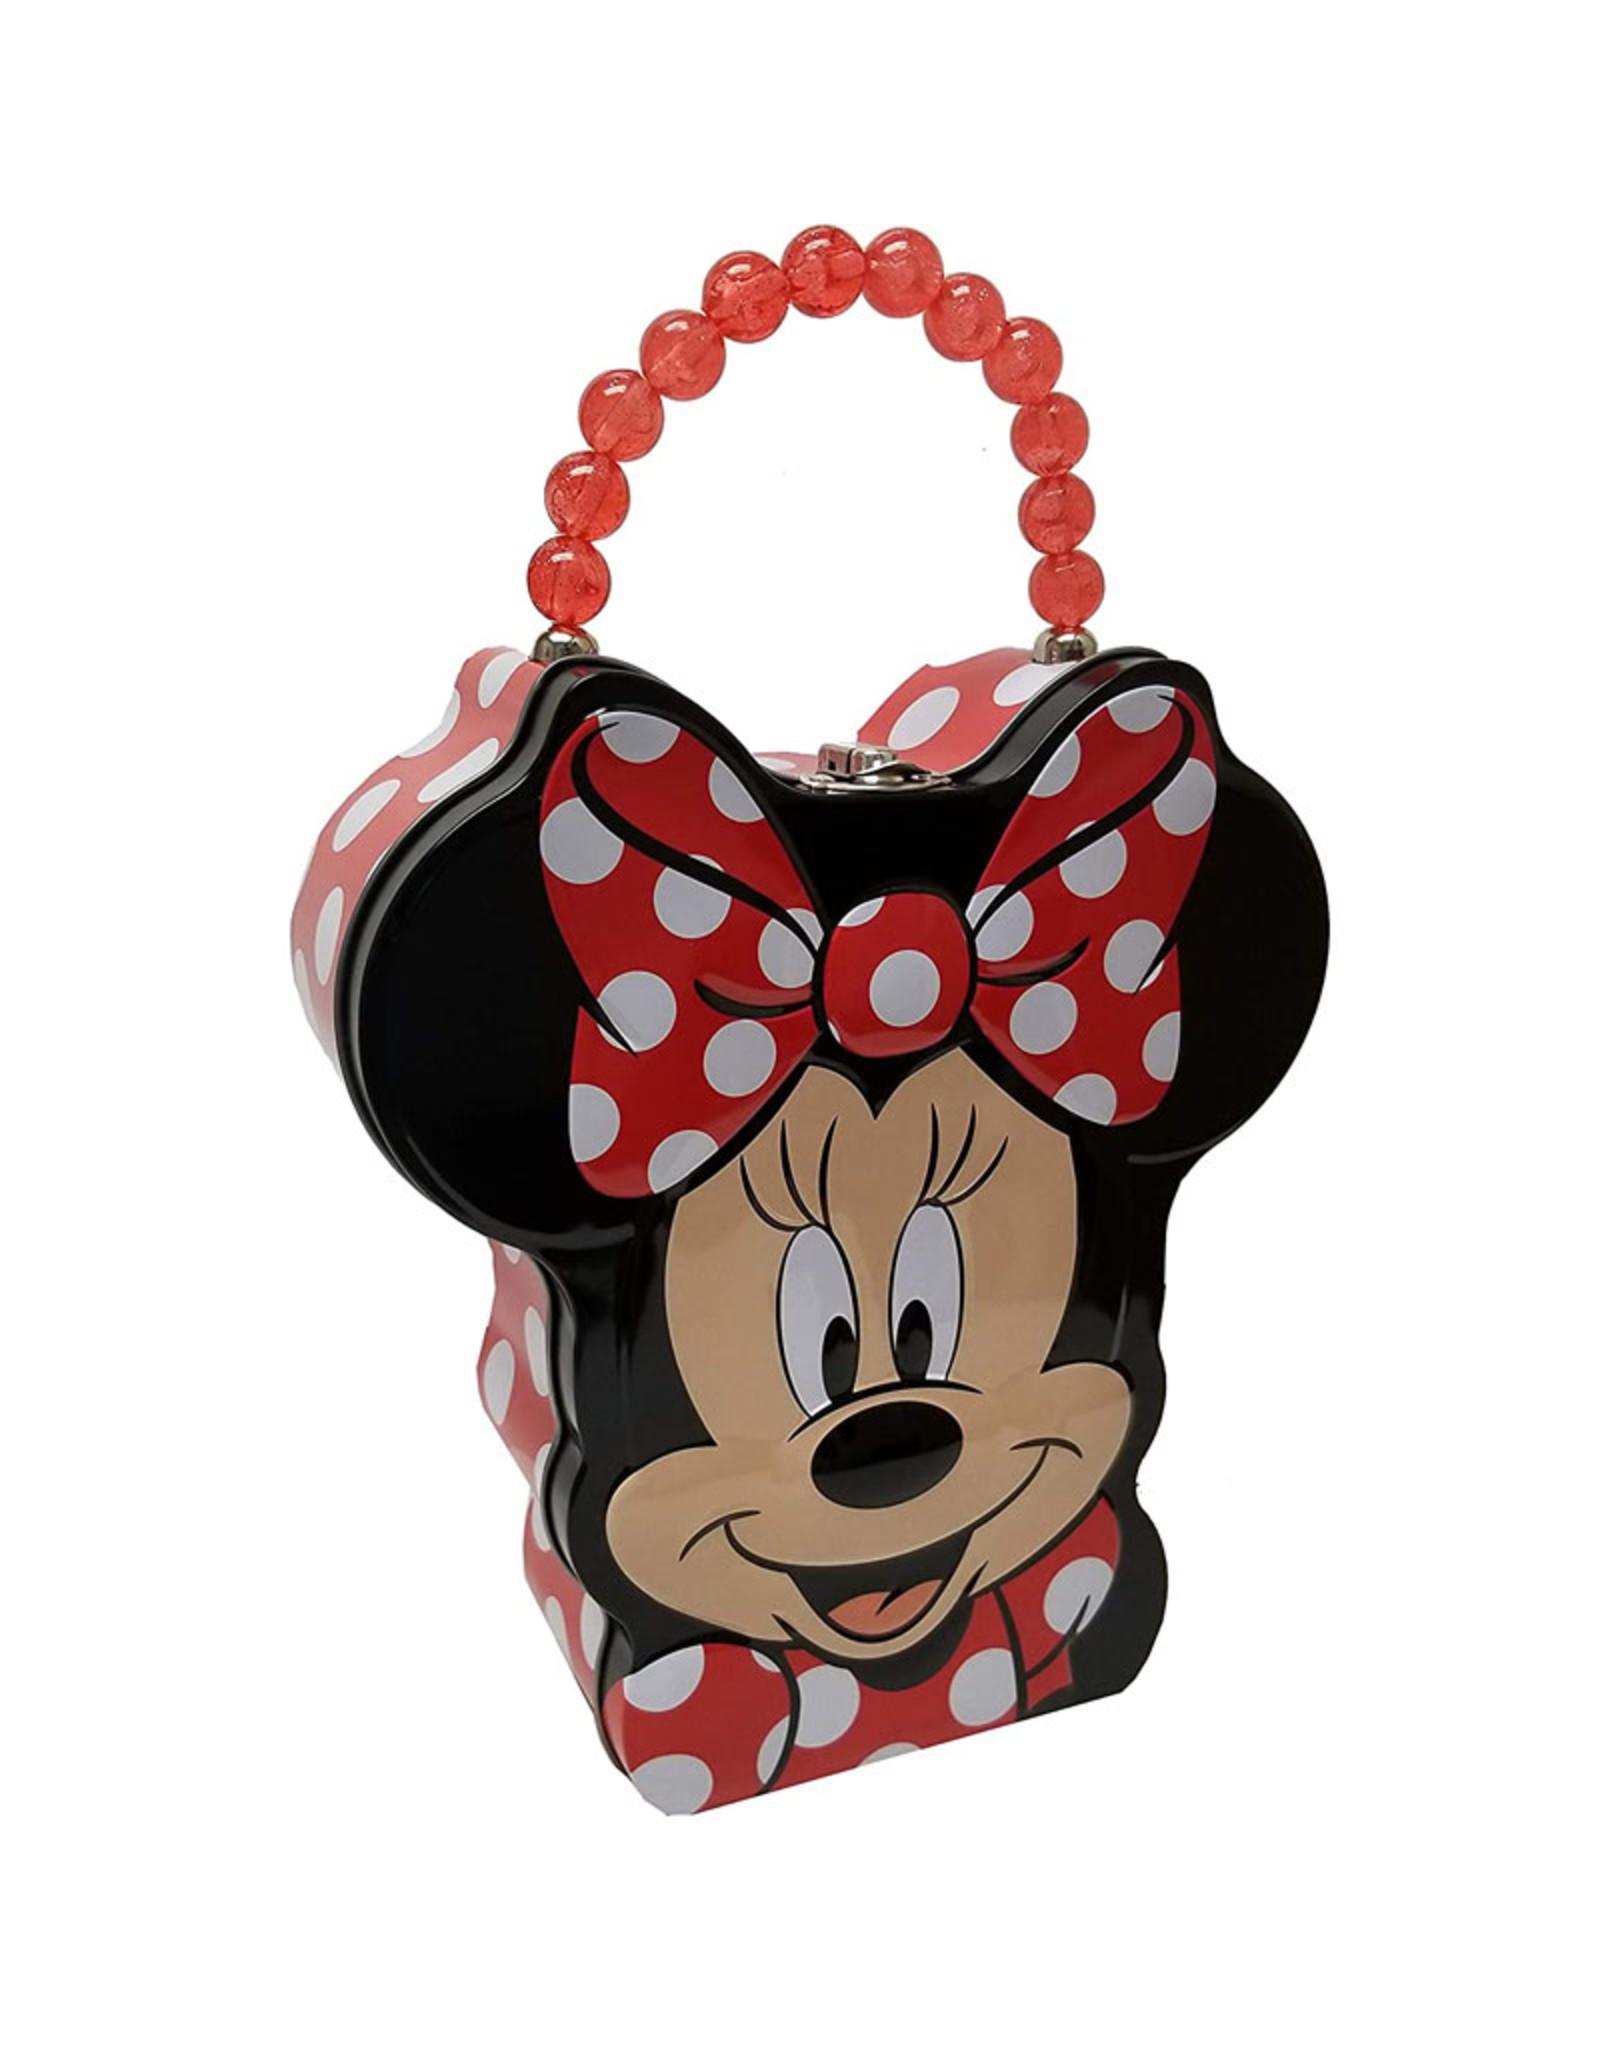 Disney Disney ( Metal Lunch Box ) Minnie Mouse